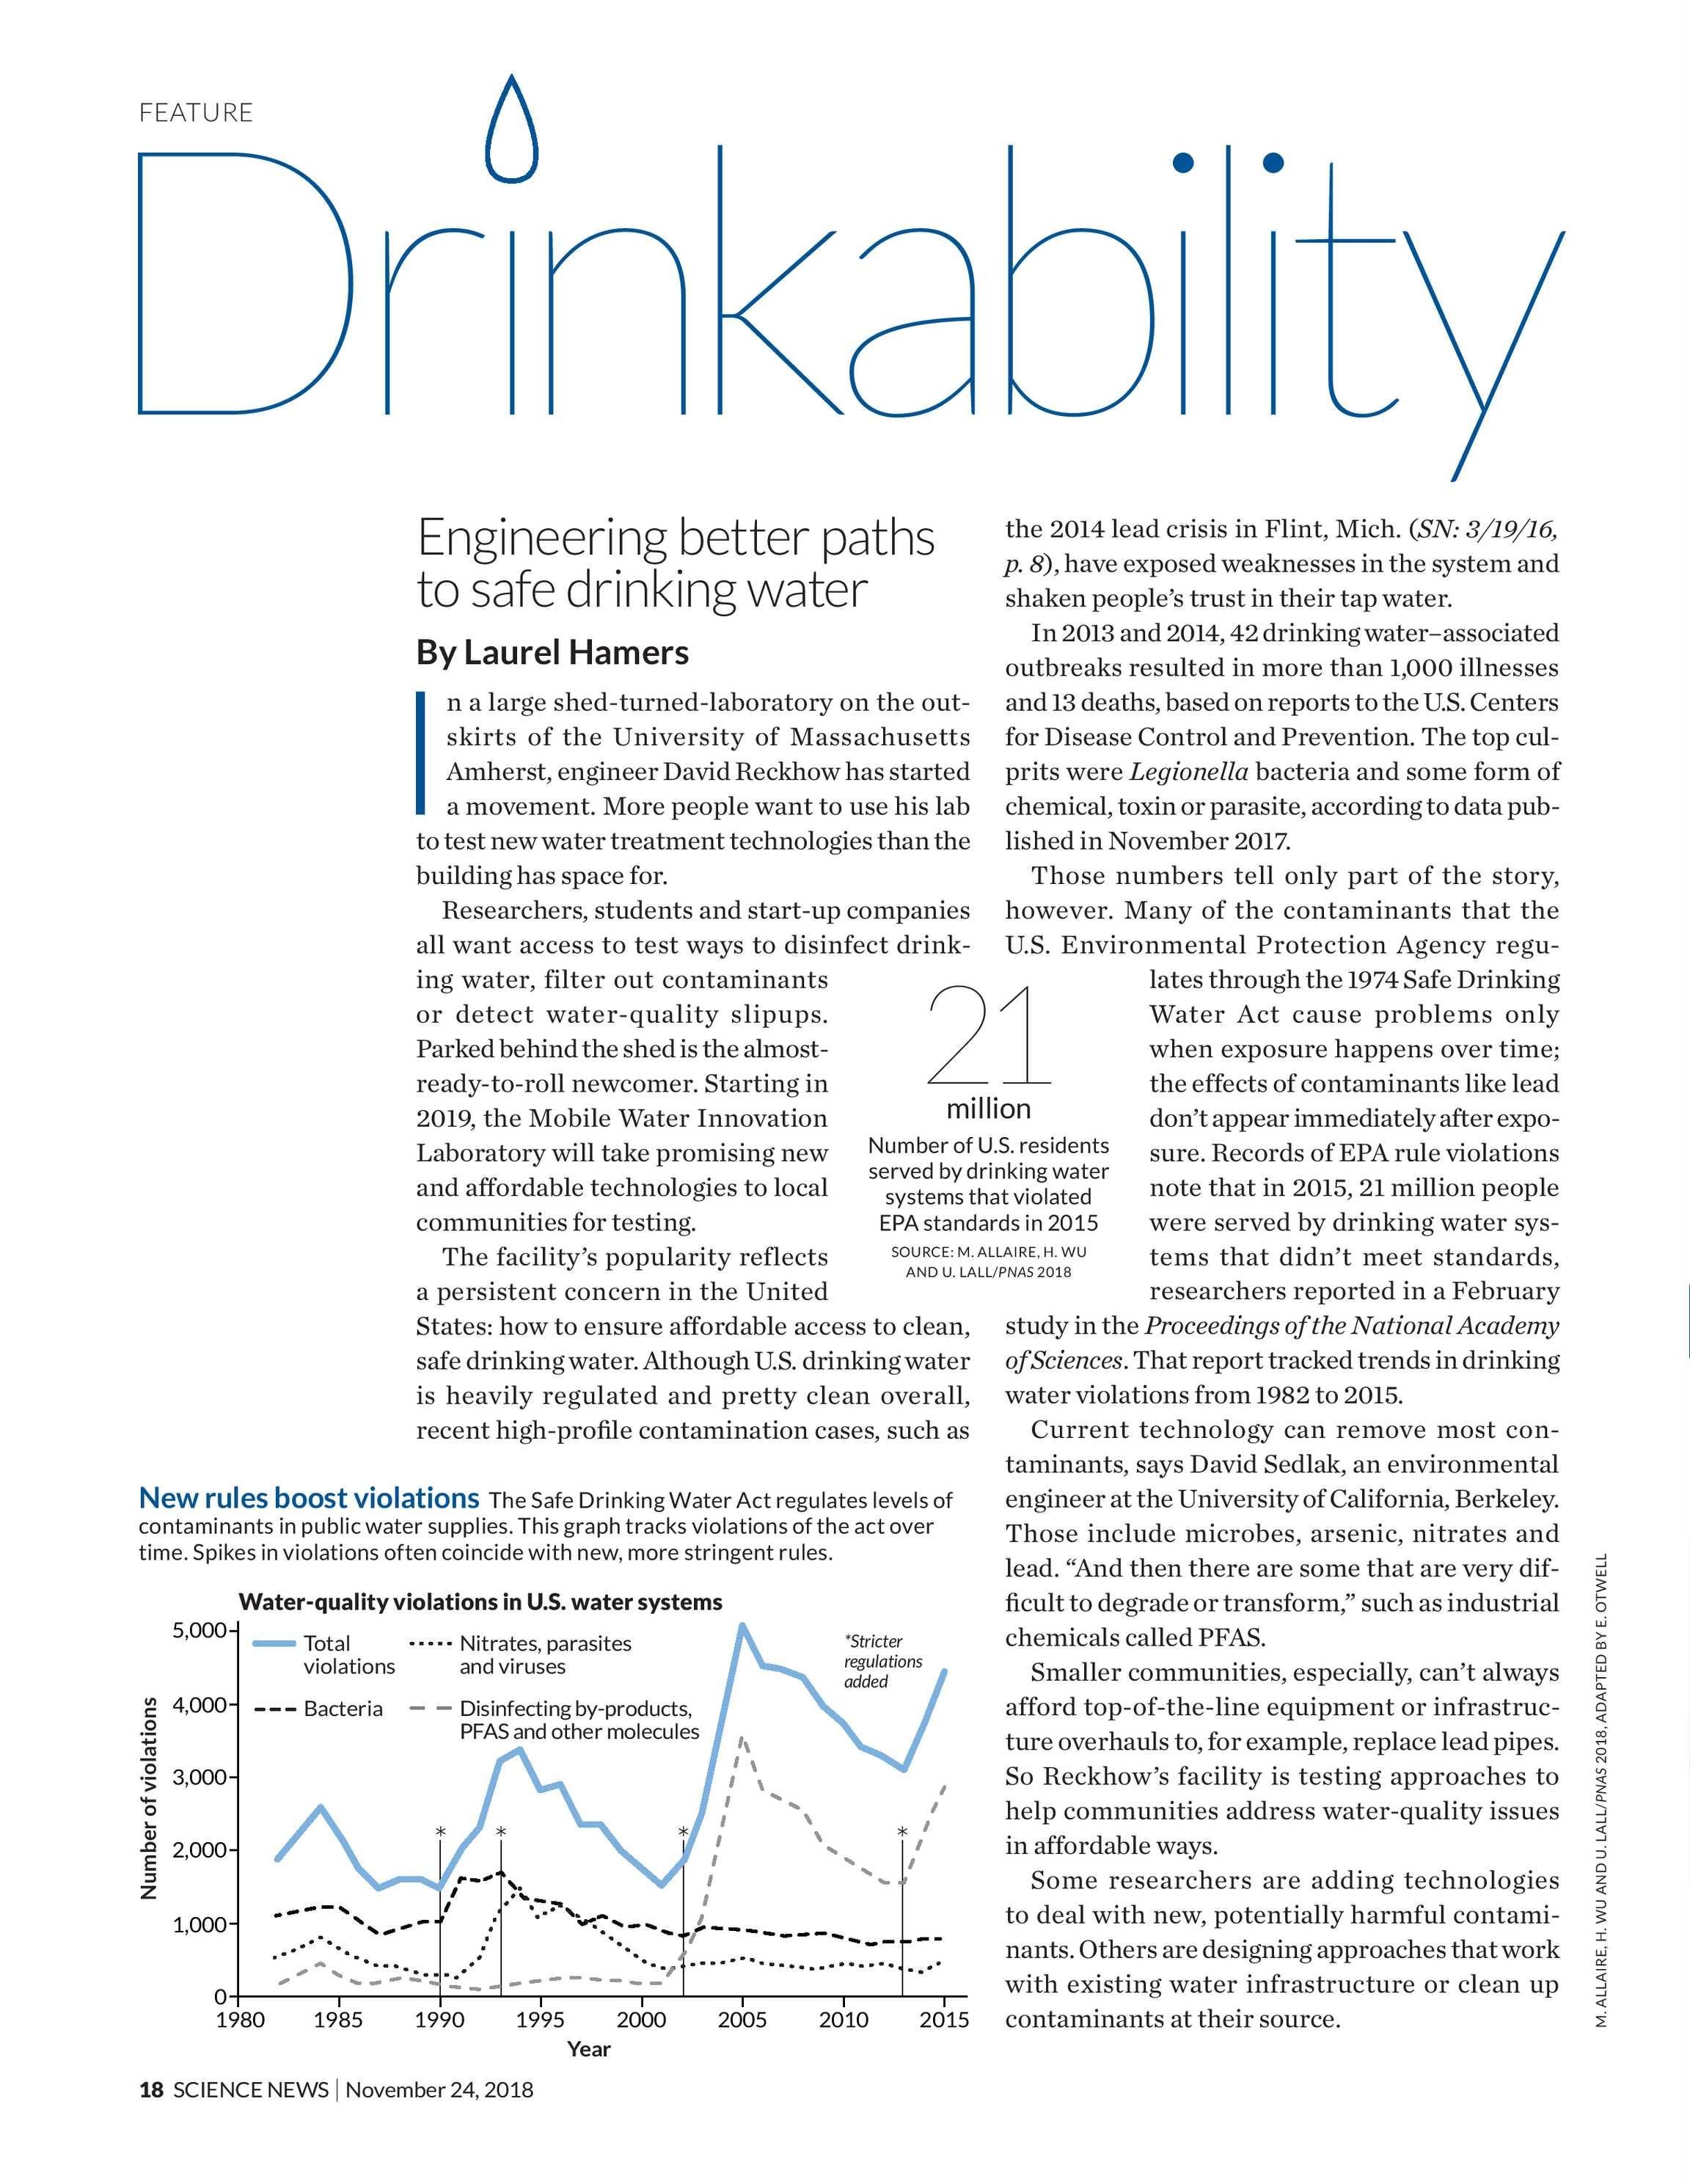 Science News - November 24, 2018 - page 17